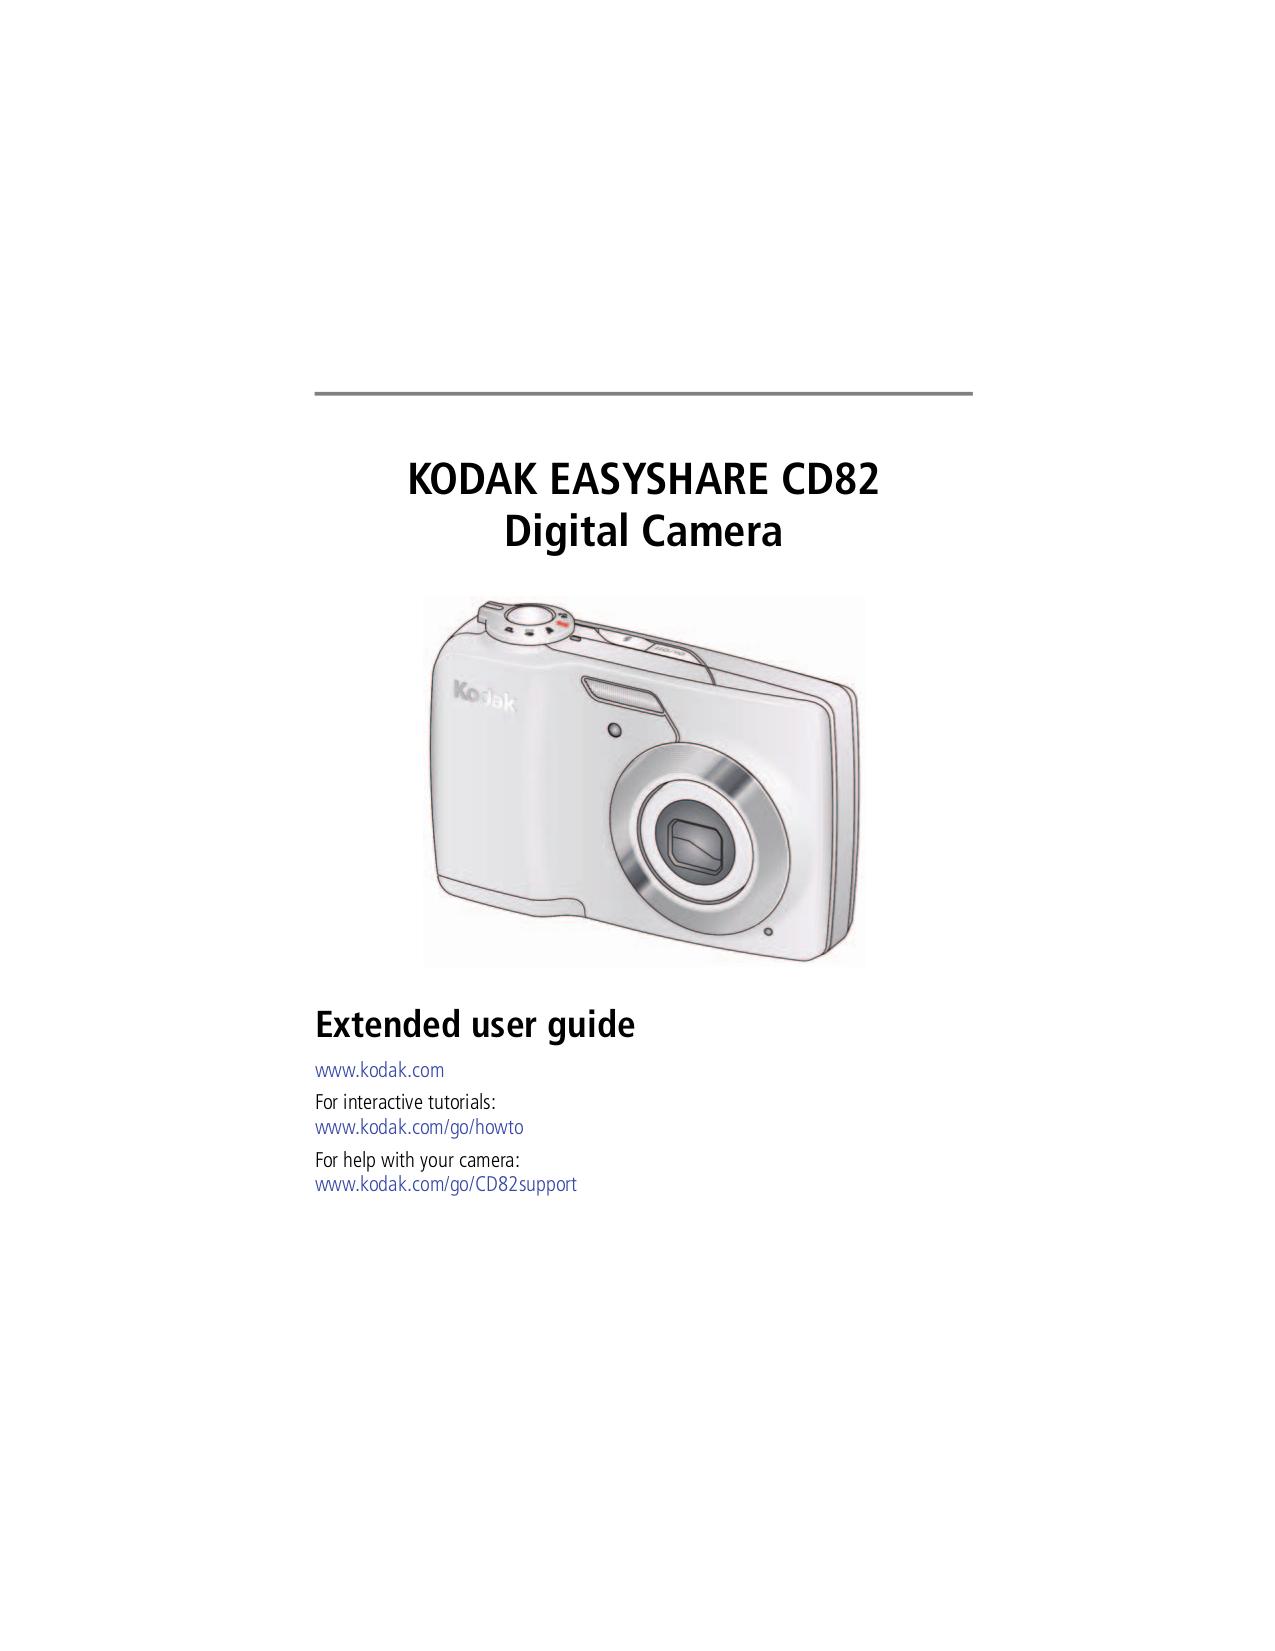 pdf for Kodak Digital Camera EasyShare CD82 manual